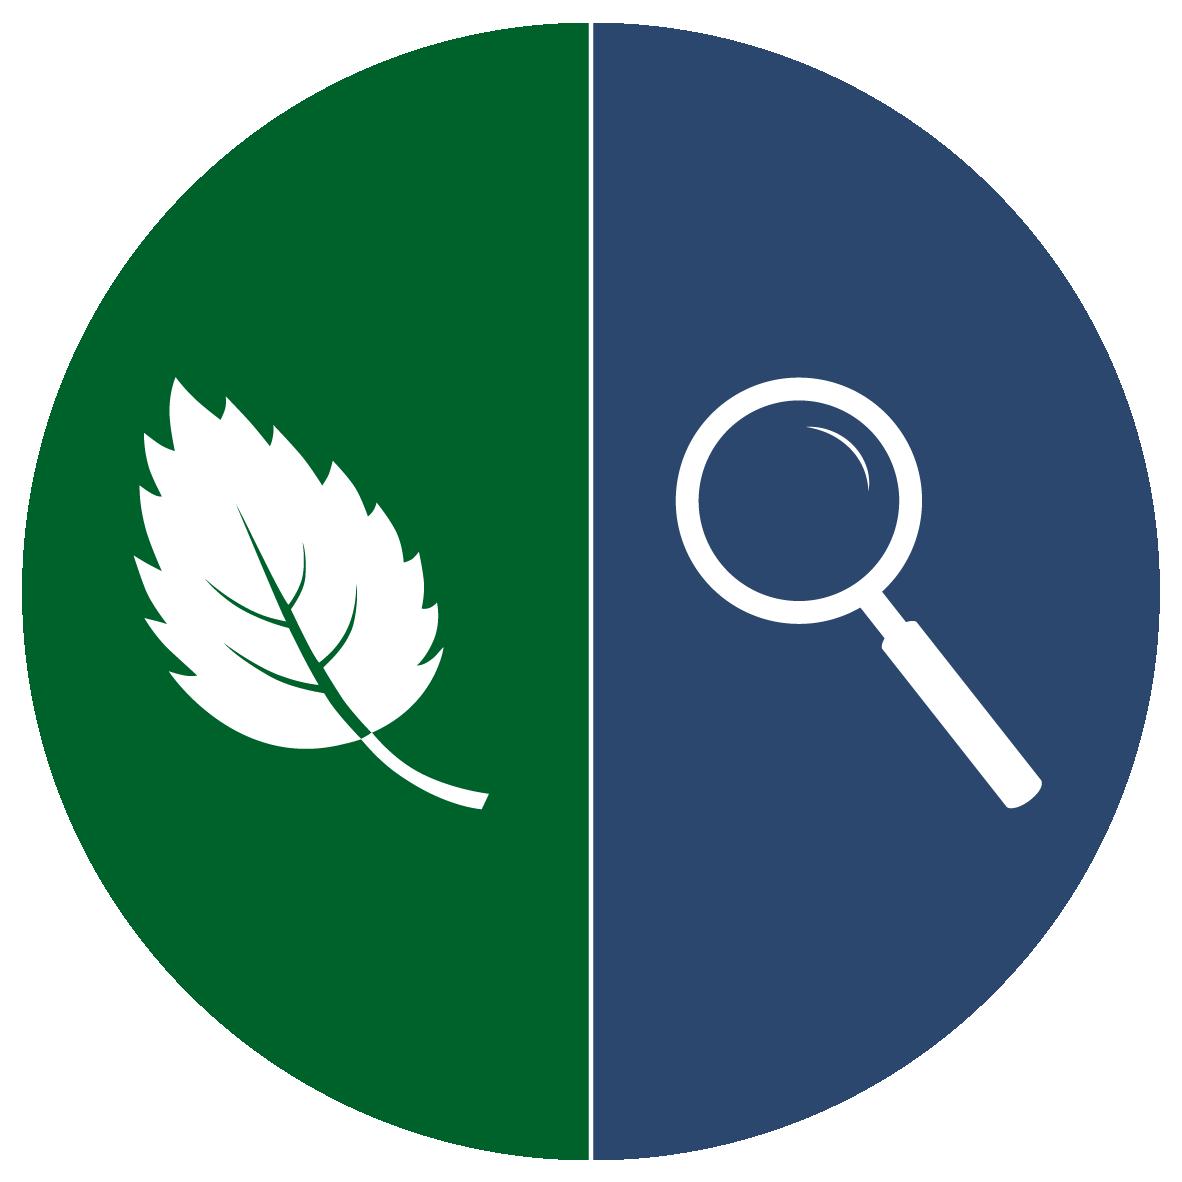 White magnifying glass icon on blue circle